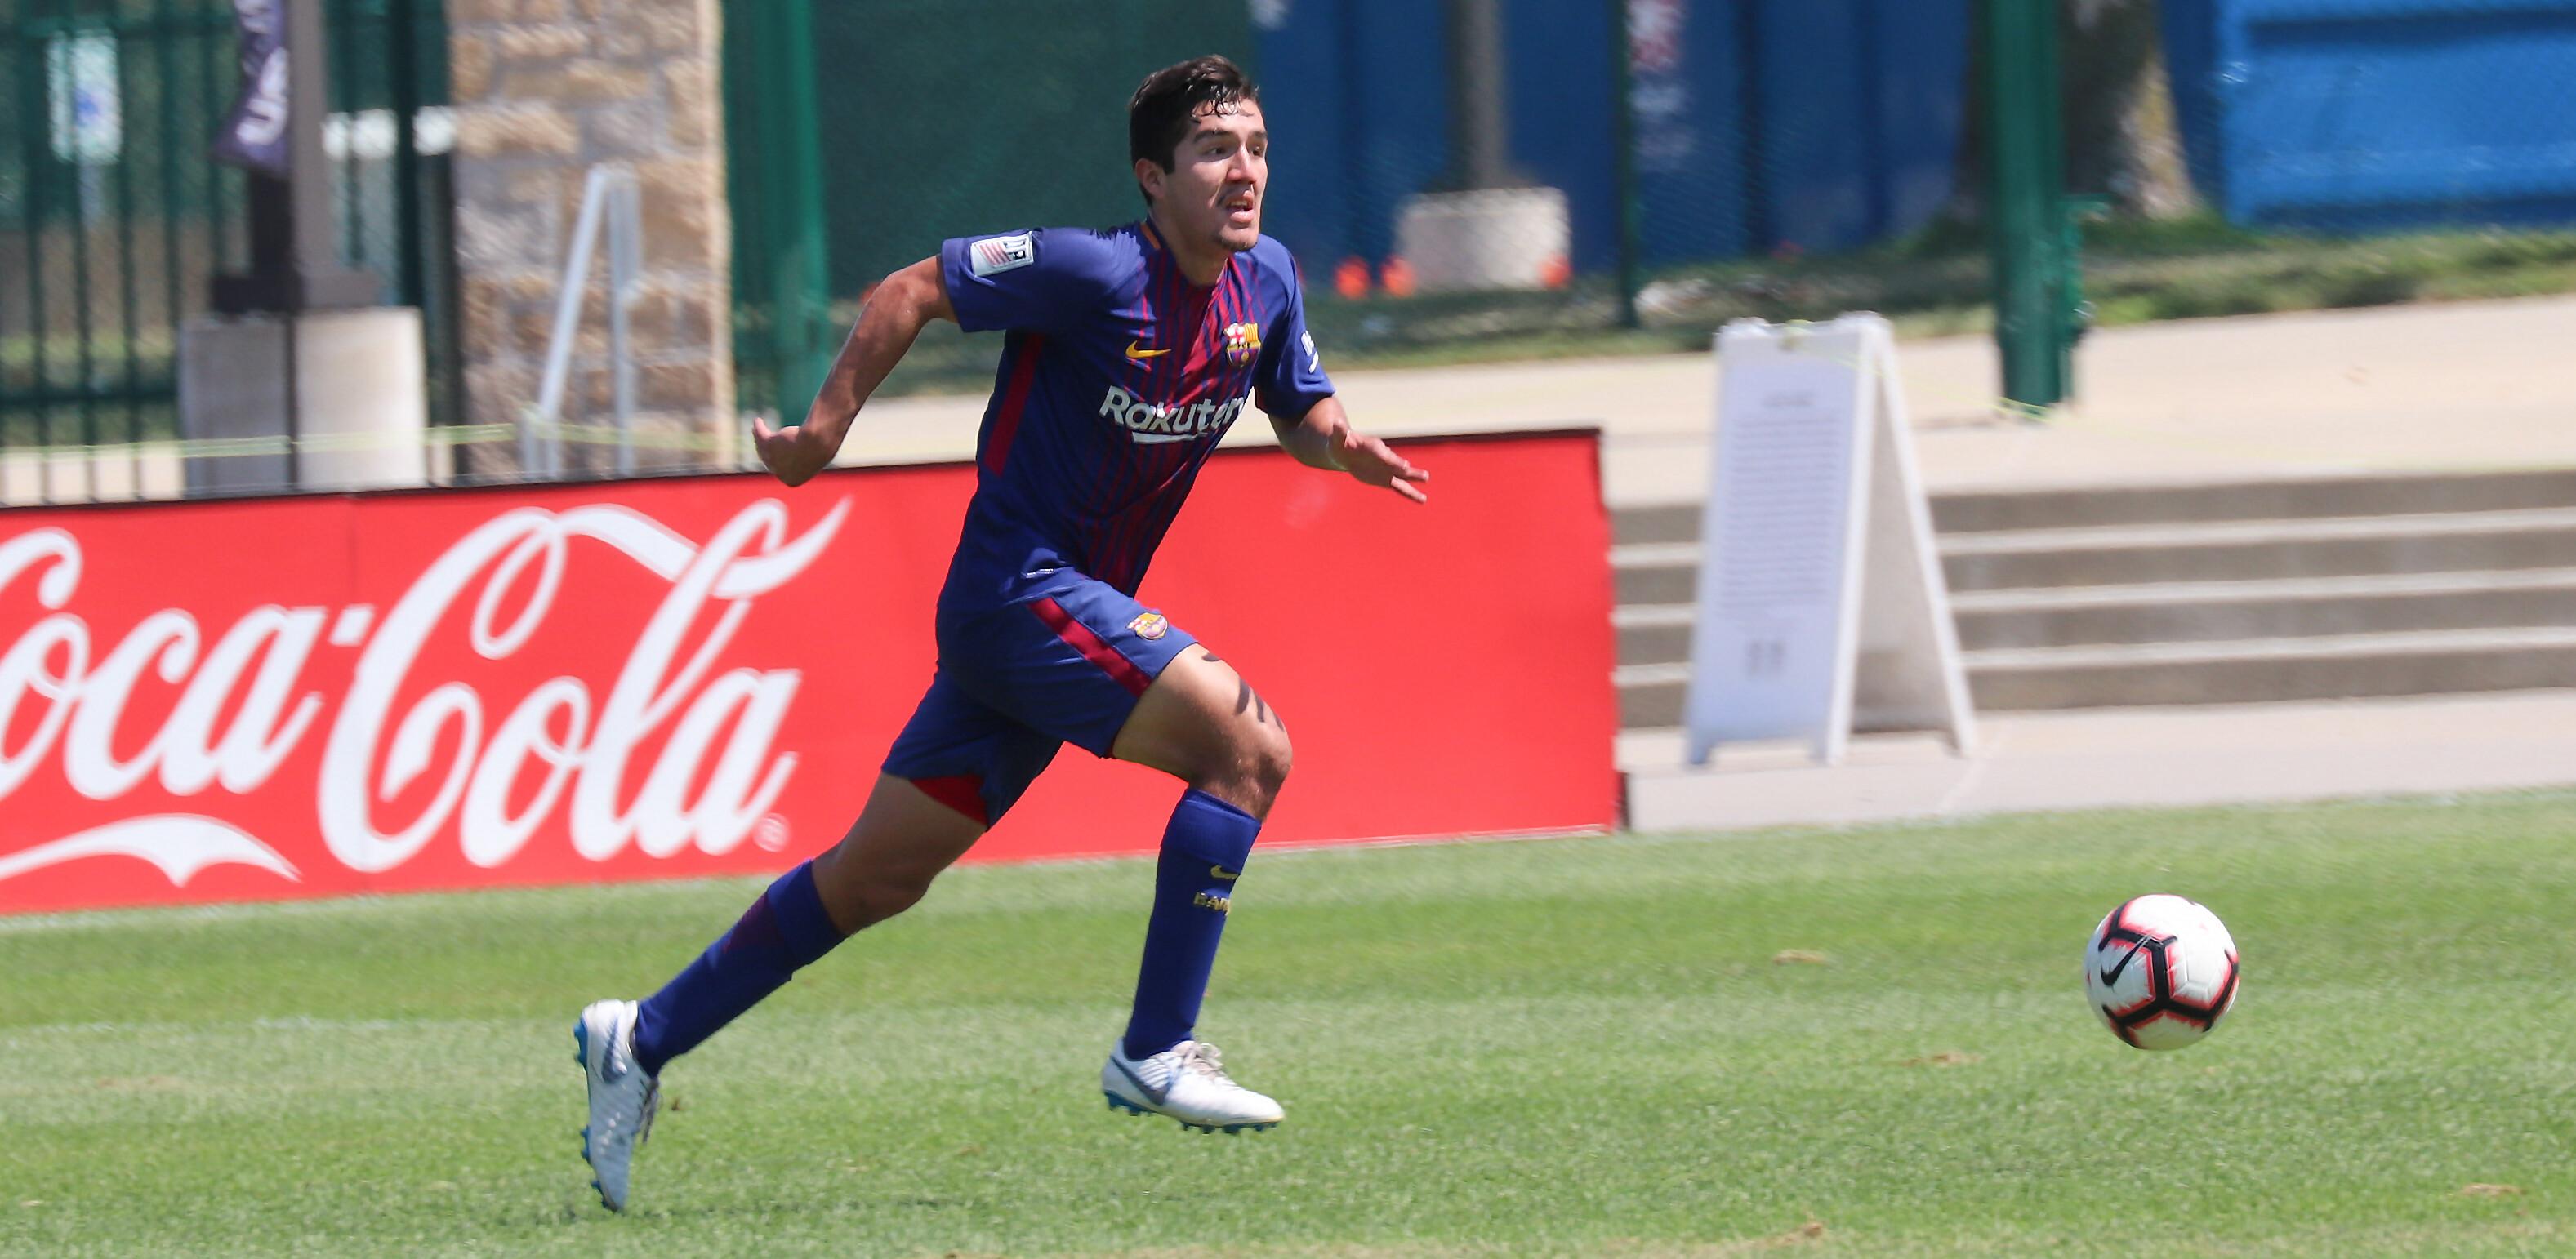 Barca Residency Academy Player, Pedro Mondragon at 2017-18 DA Championships